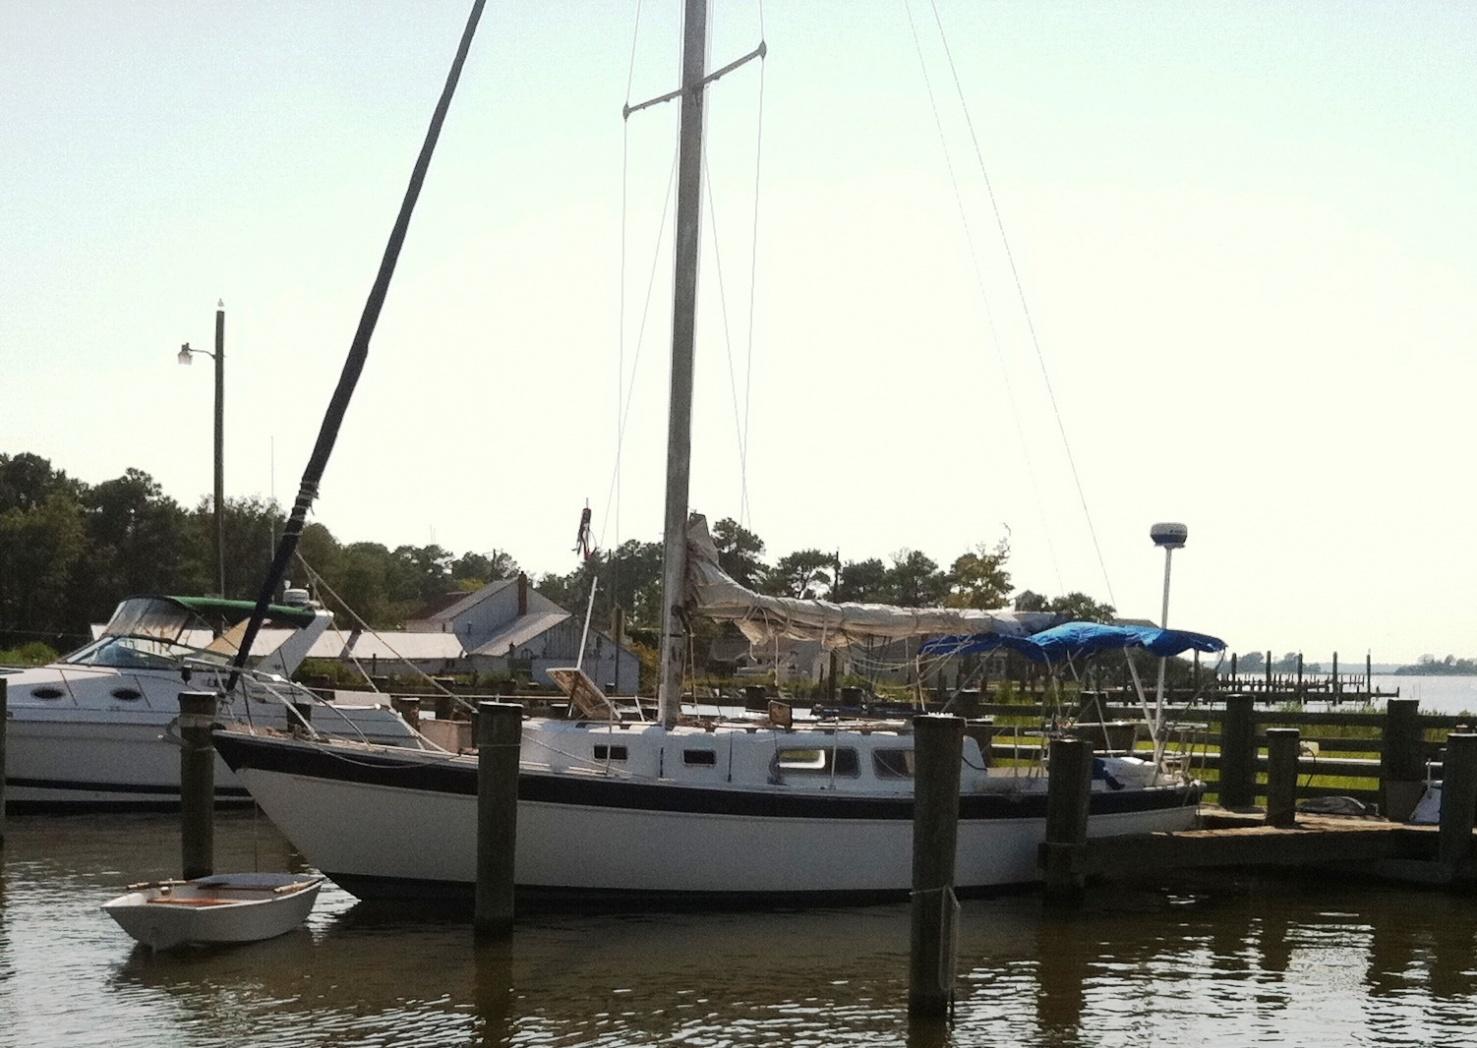 Click image for larger version  Name:Sailboat2.jpg Views:116 Size:397.7 KB ID:43381